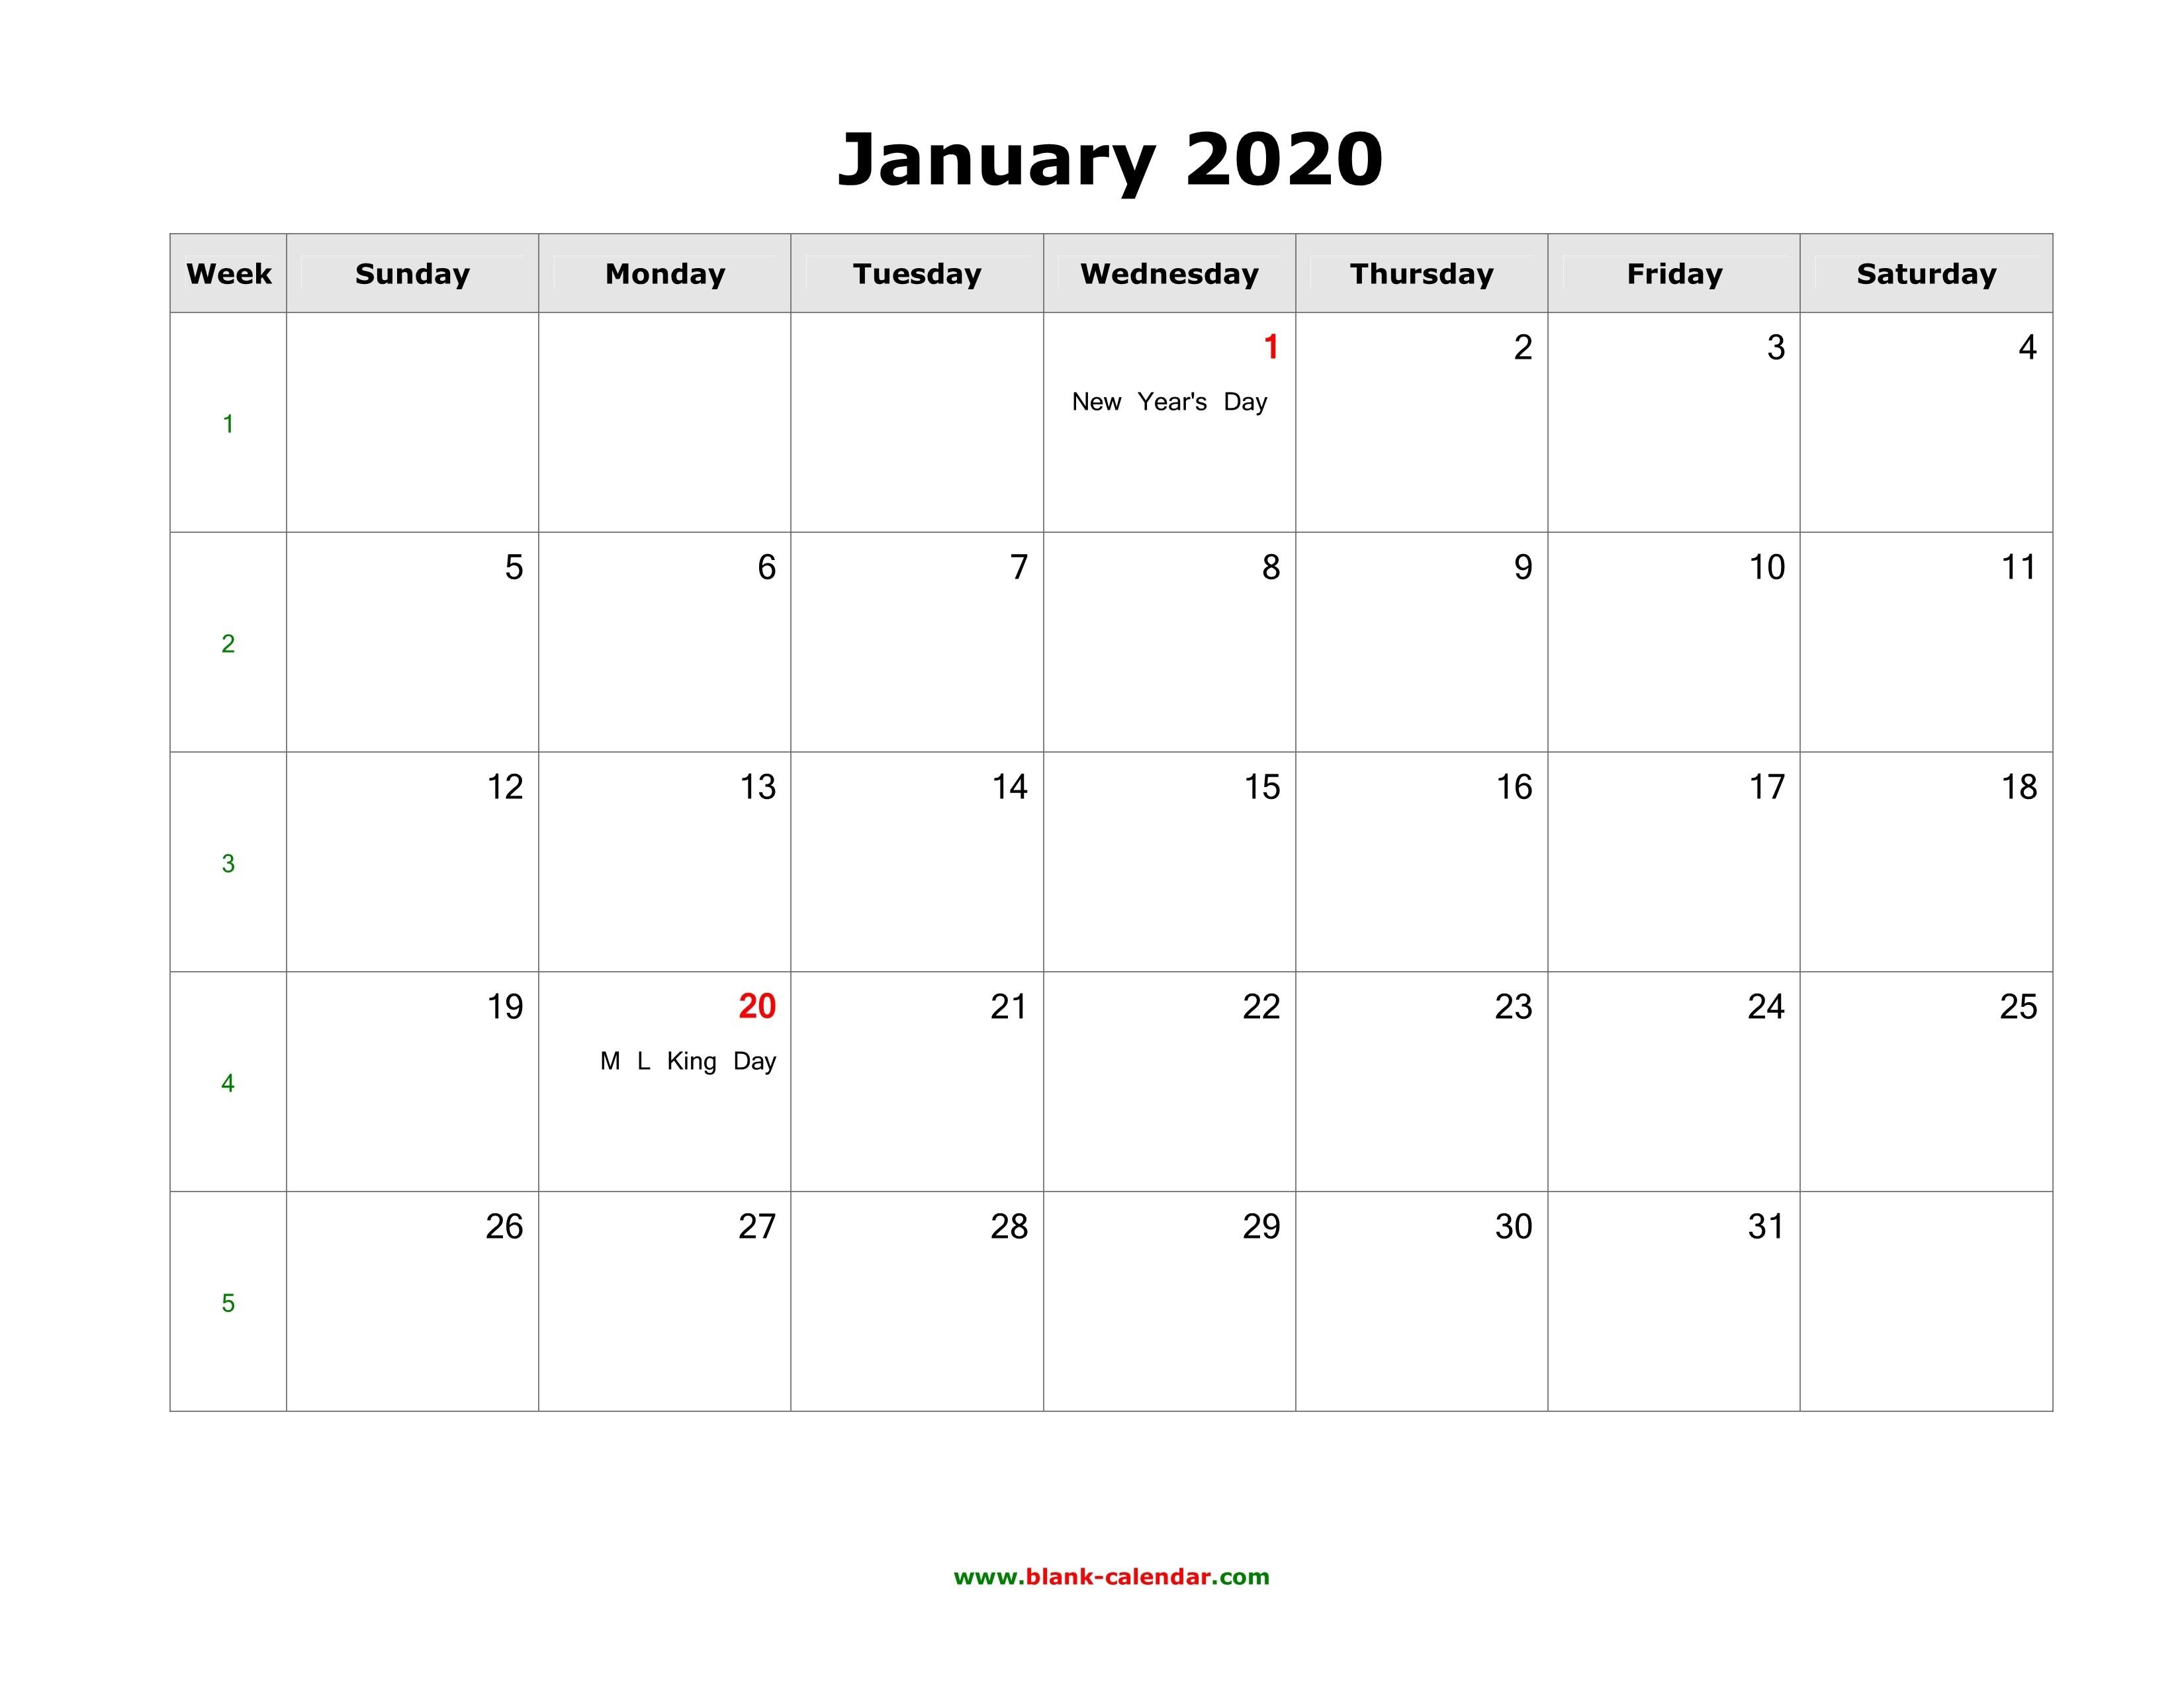 January 2020 Blank Calendar | Free Download Calendar Templates-Blank January 2020 Calendar